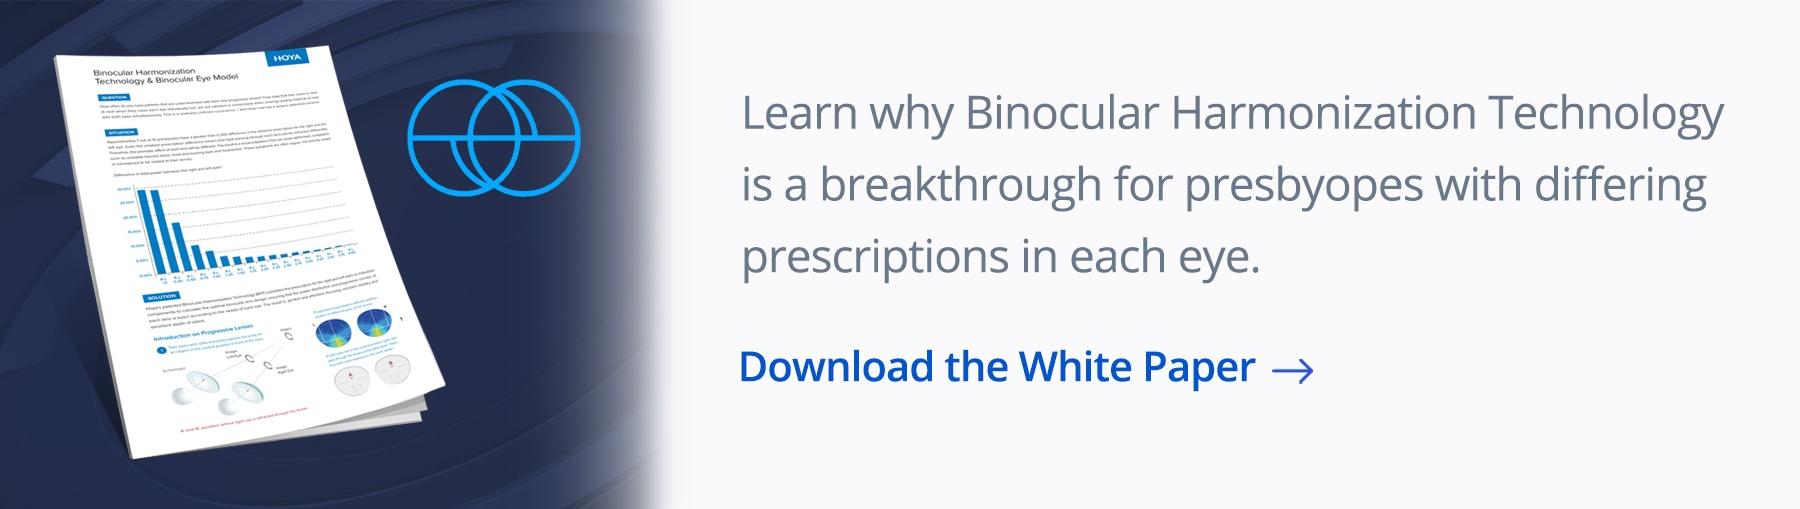 Download-the-Binocular-Harmonization-Technology-white-paper